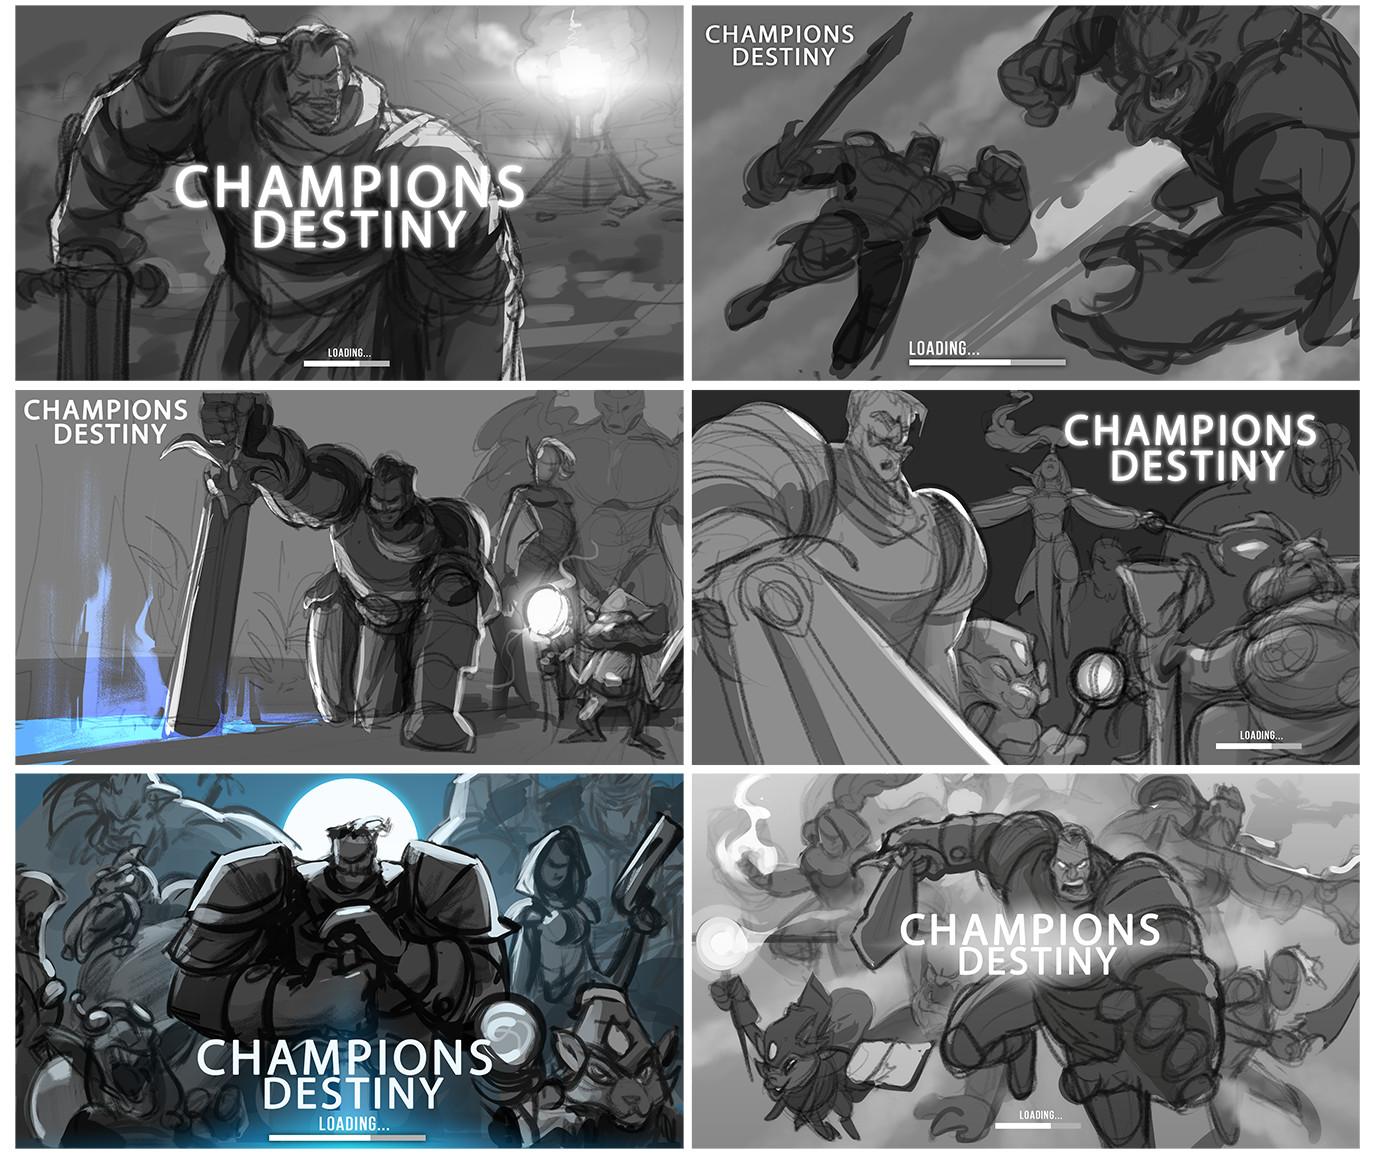 ArtStation - Champions Destiny, Guillem Serret